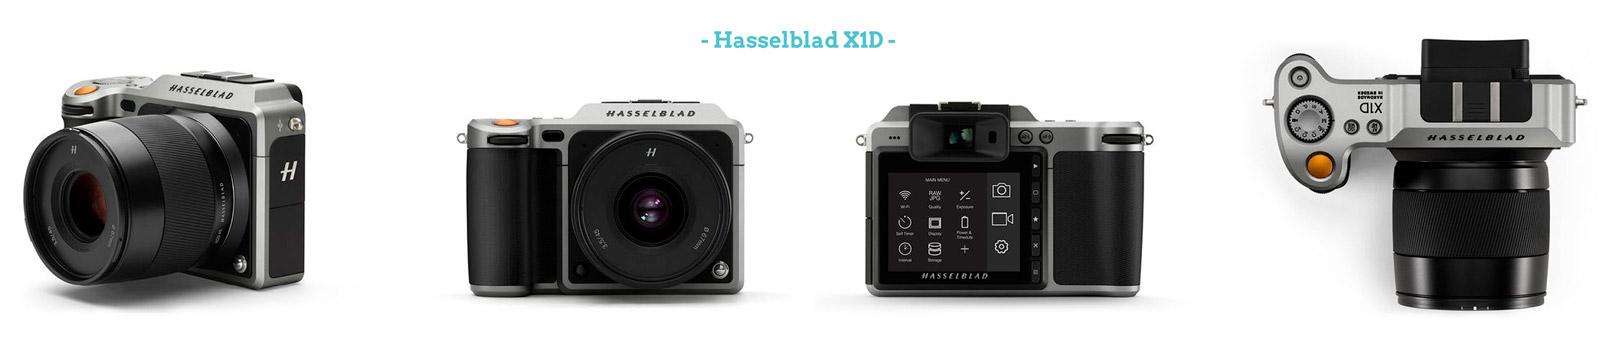 Diseño Desing Hasselblad X1D